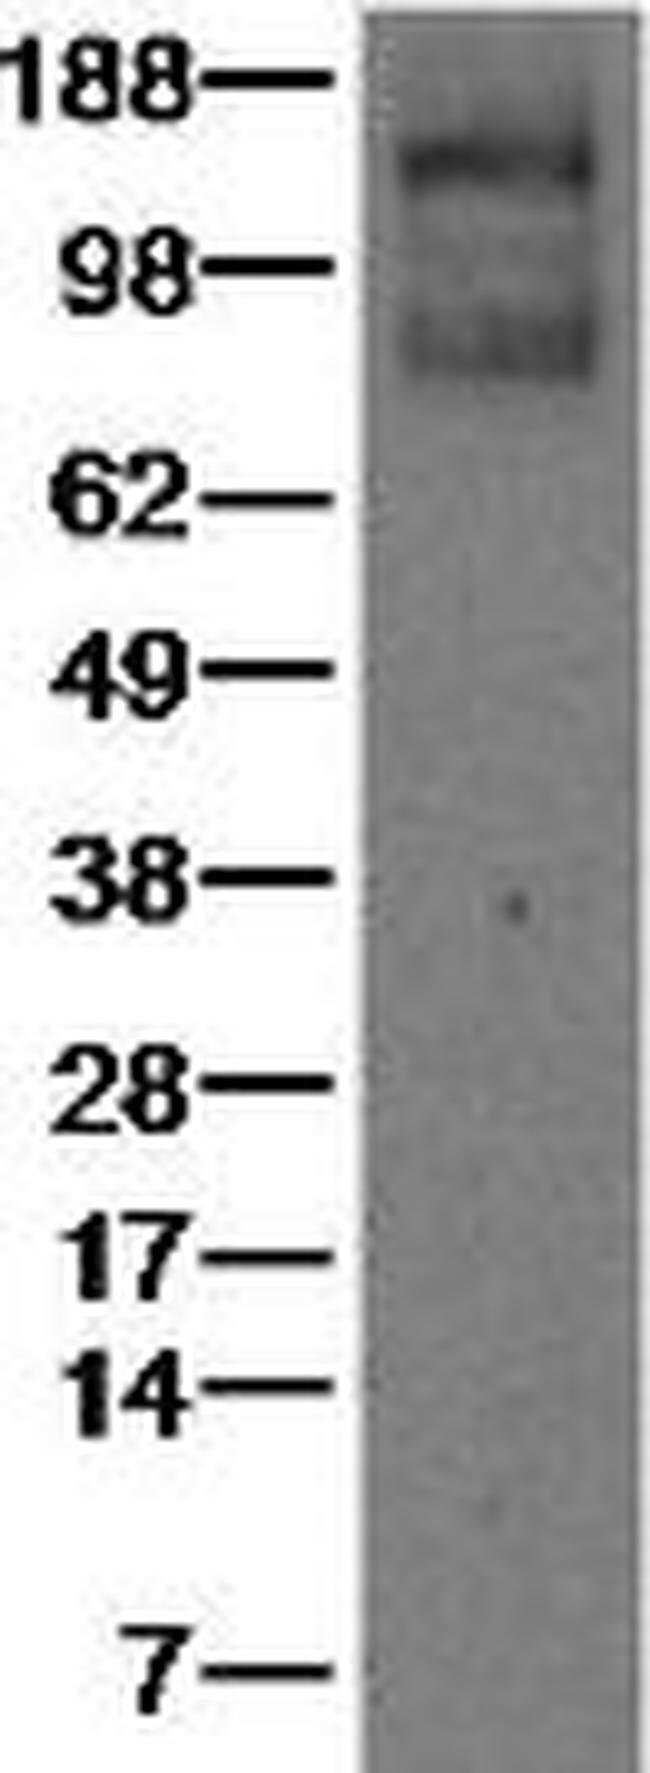 VEGF Receptor 1 (Flt1) Rat anti-Human, Clone: 7A6, eBioscience™ 25 μg; Unconjugated VEGF Receptor 1 (Flt1) Rat anti-Human, Clone: 7A6, eBioscience™